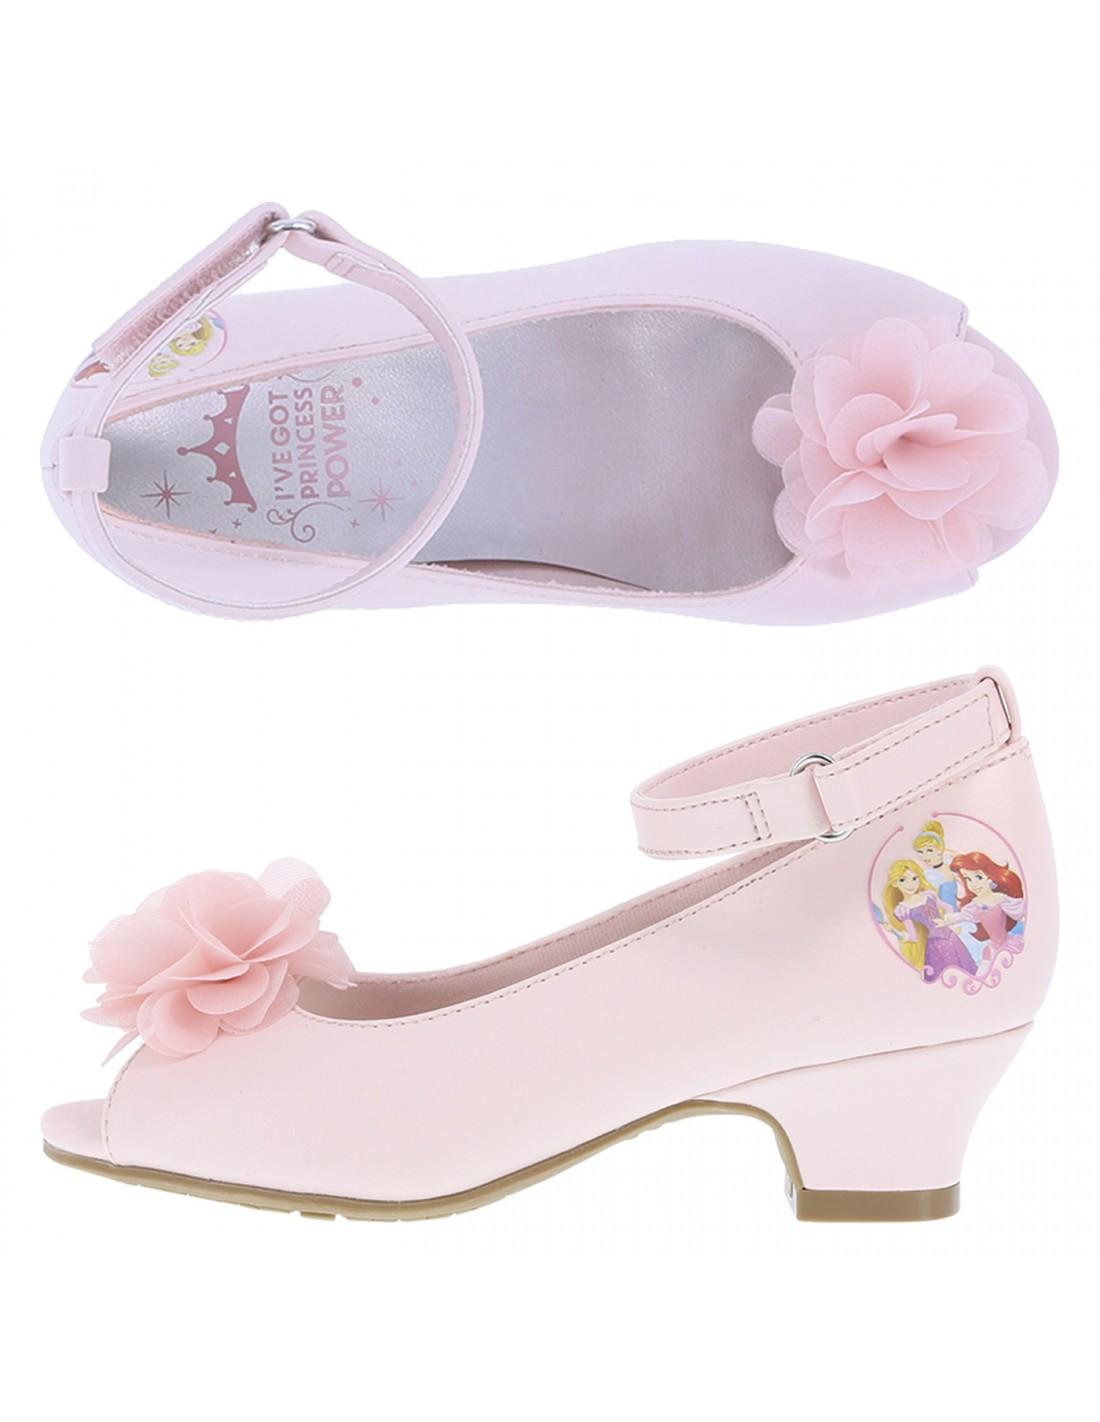 d94e71ae Tacones de flores para niñas pequeñas princesas de Disney / Payless